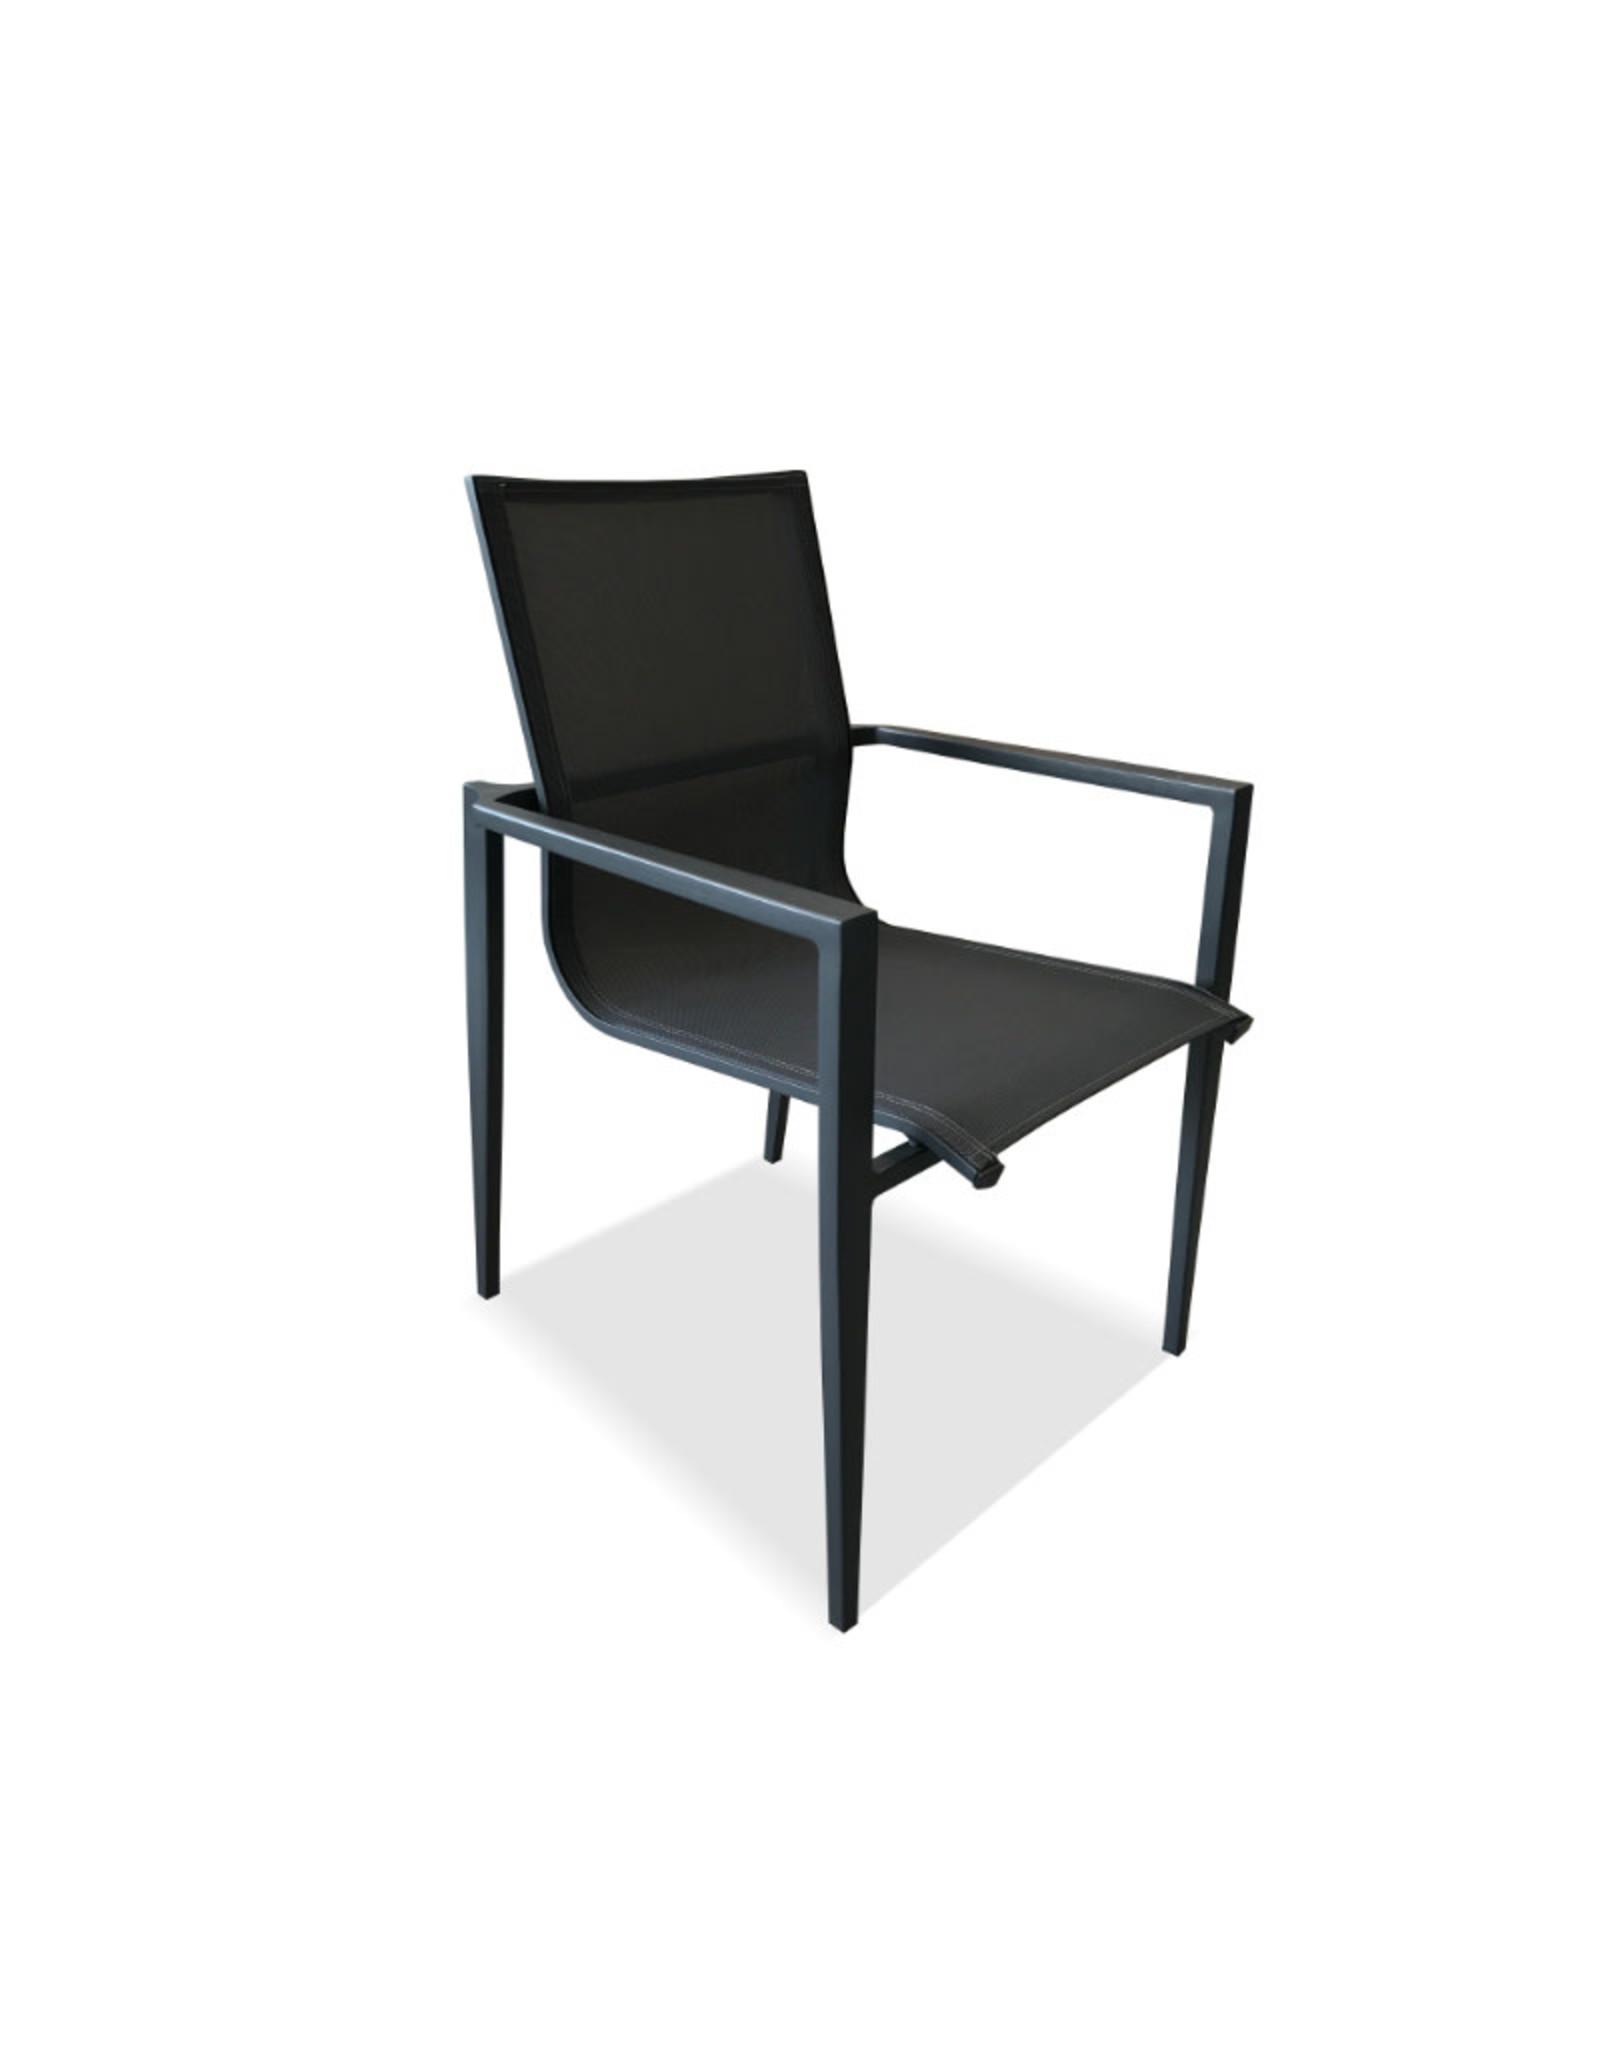 Hamilton Bay OUTDOOR Hamilton Bay OUTDOOR Aurora alu. Dining Chair antraciet textileen